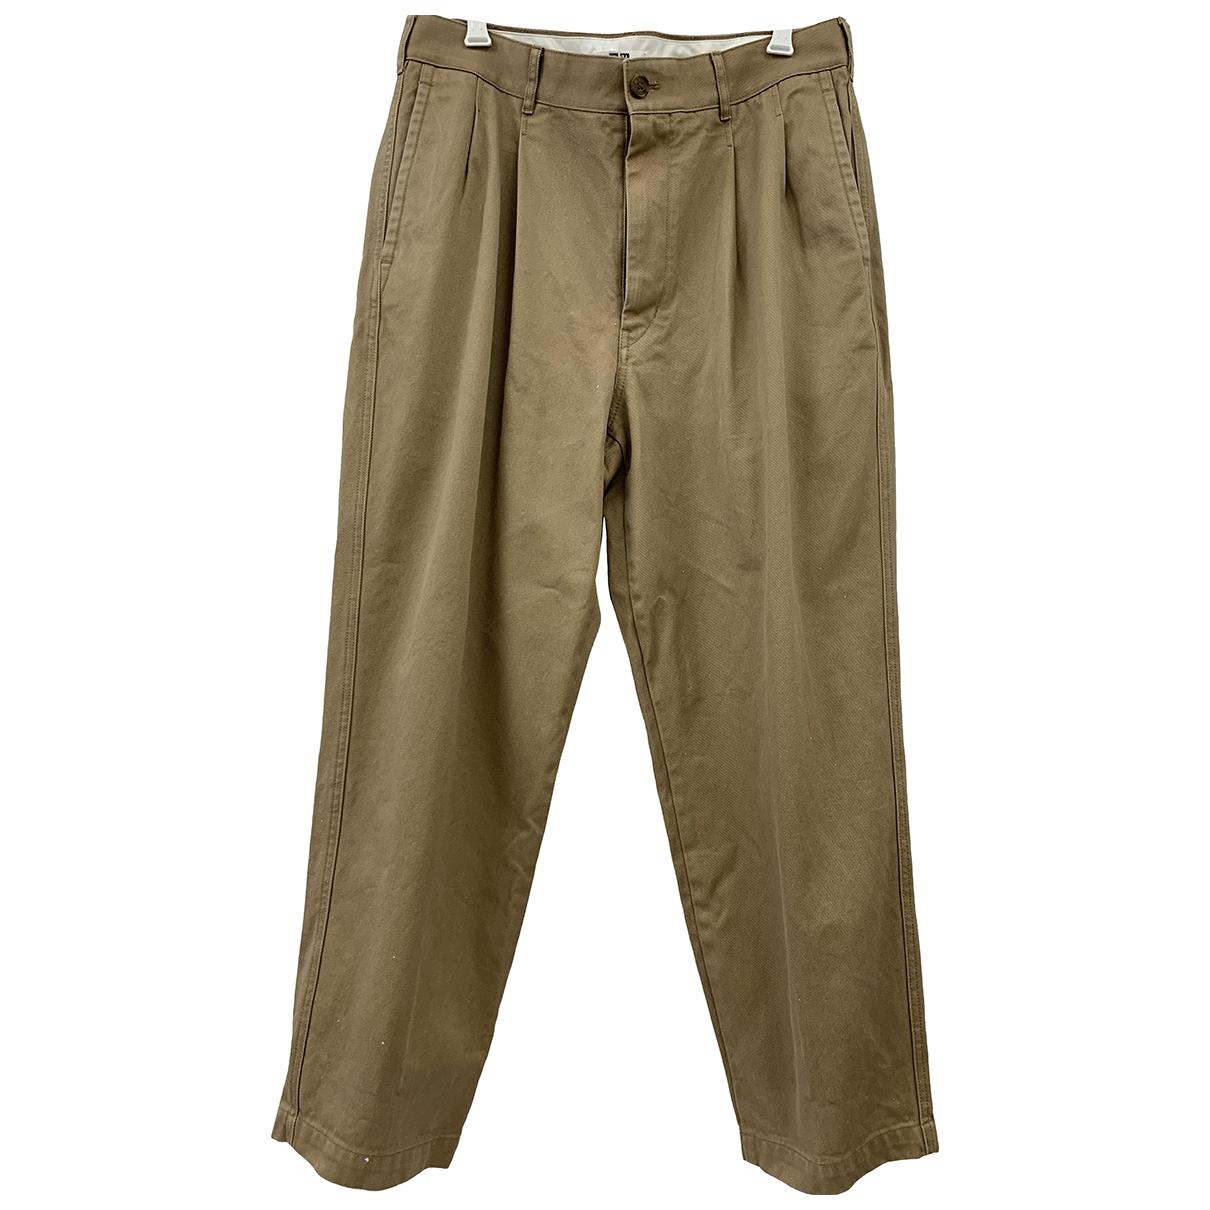 Uniqlo \N Beige Cotton Trousers for Men L International